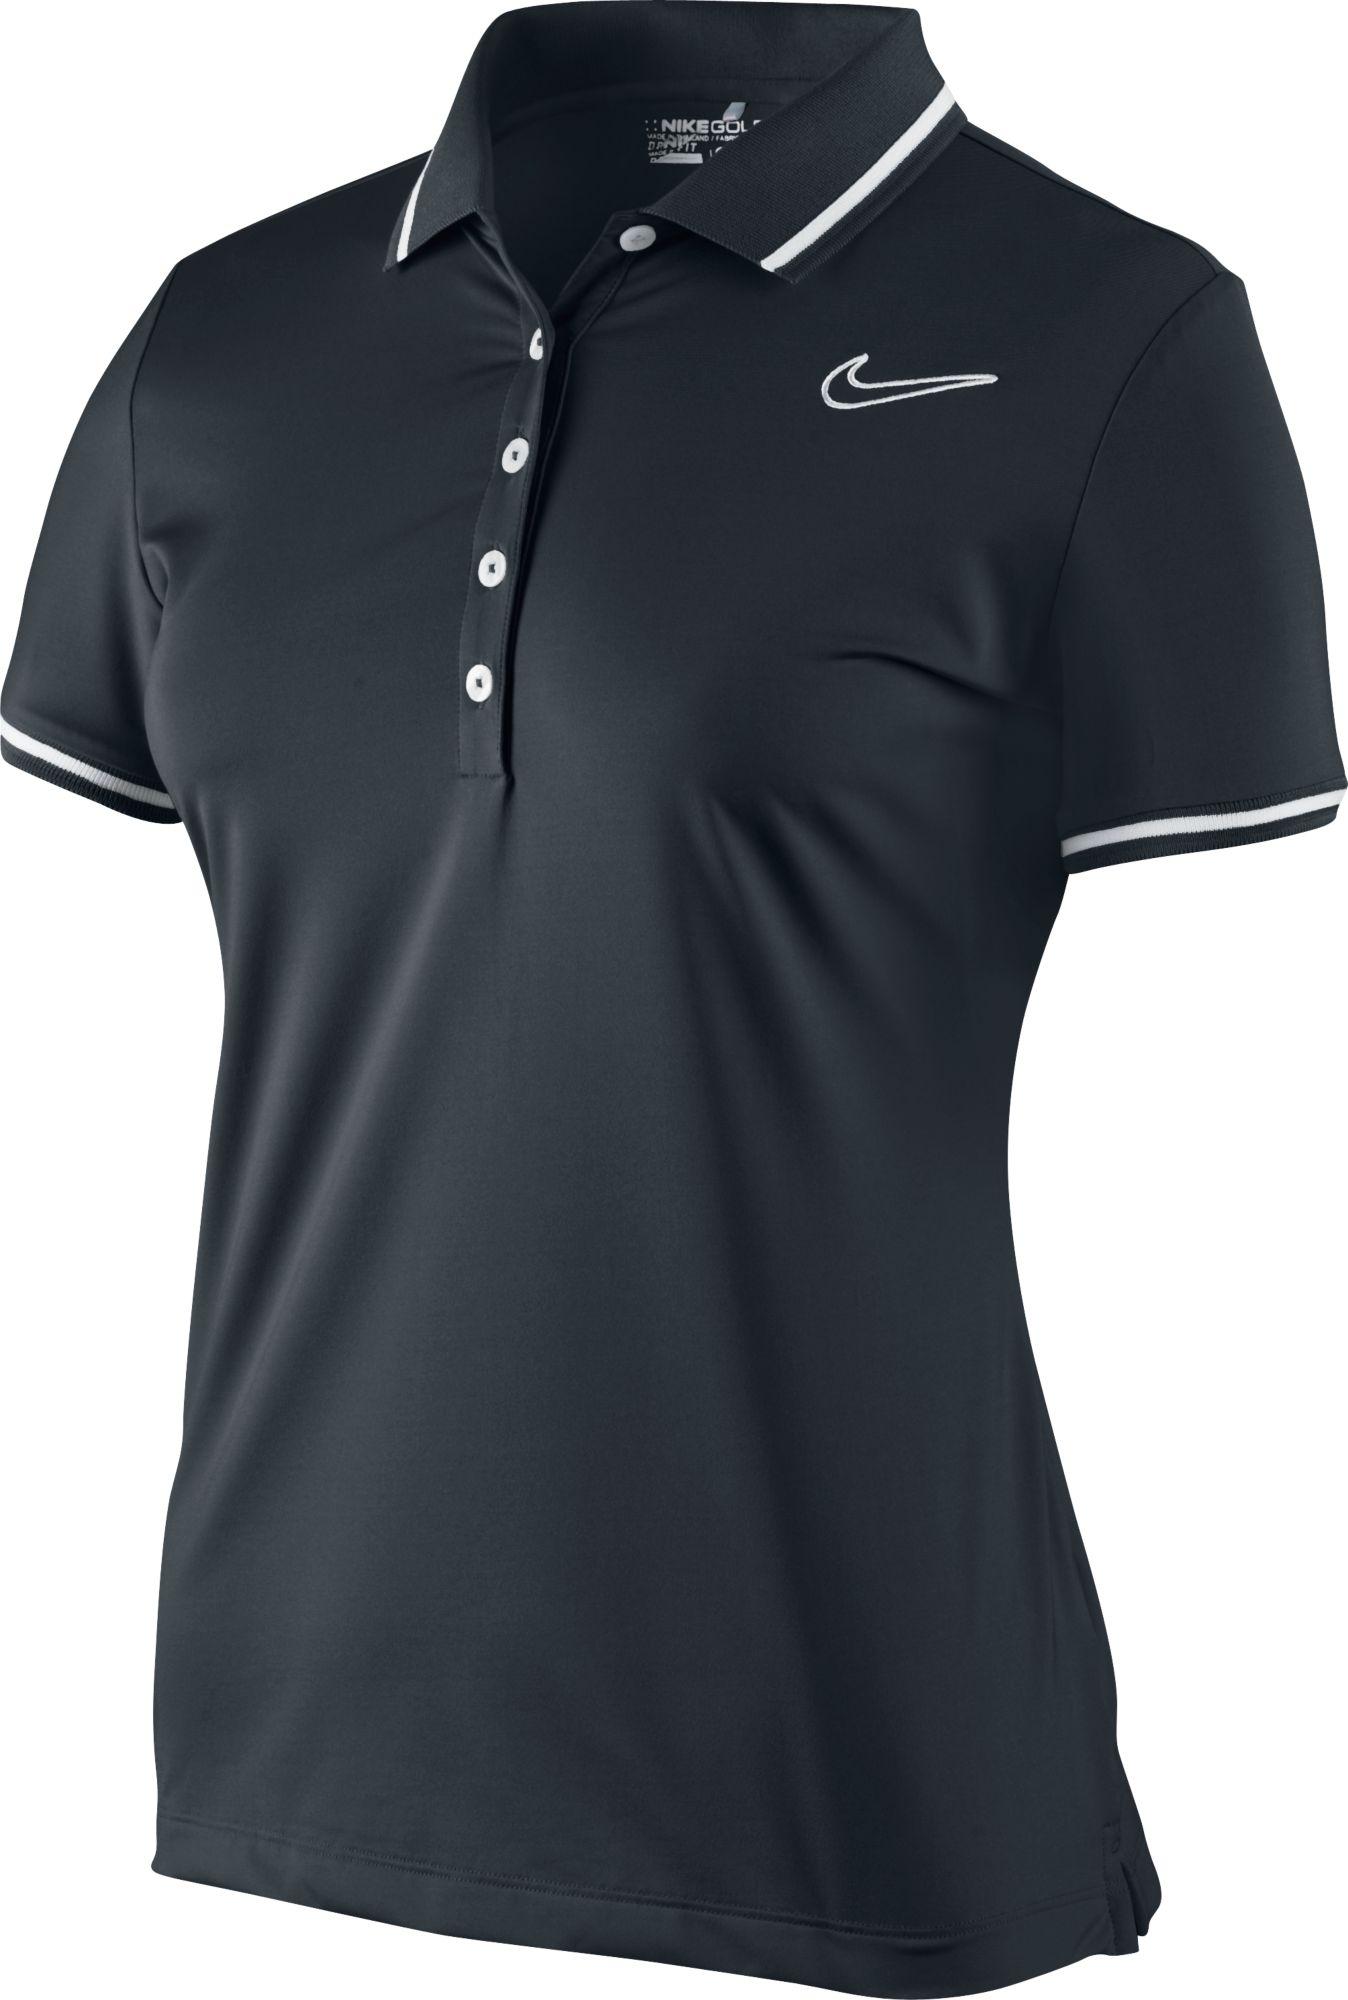 Nike Women's Swoosh Short Sleeve Polo